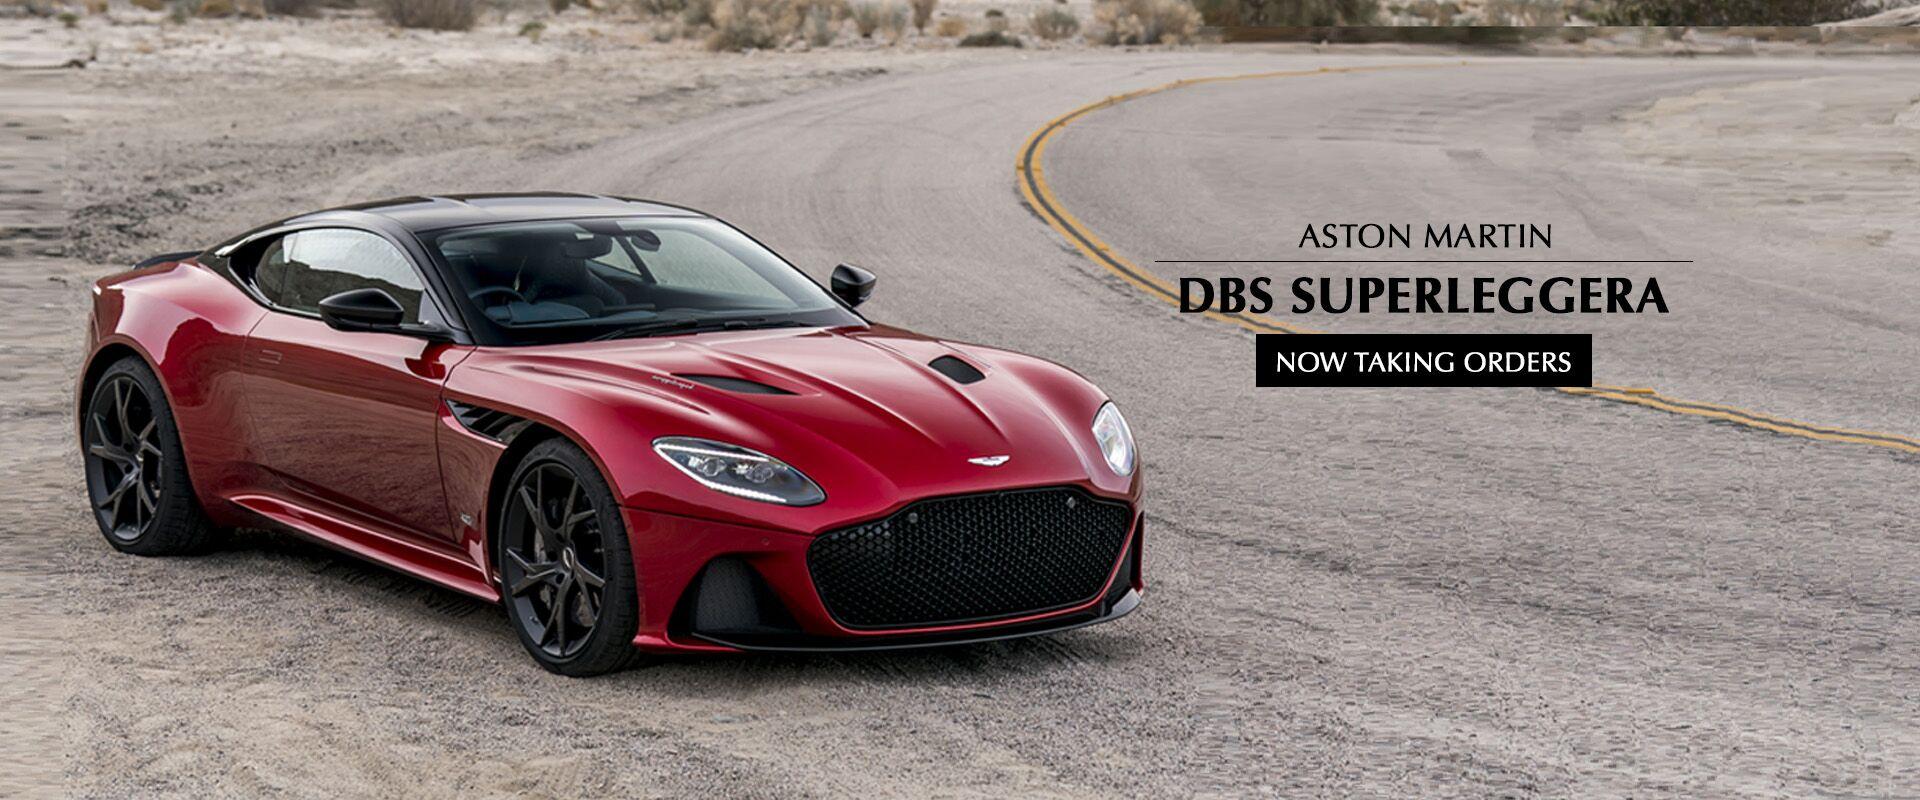 Aston Martin Bentley Bugatti Lamborghini Rolls Royce Dealership